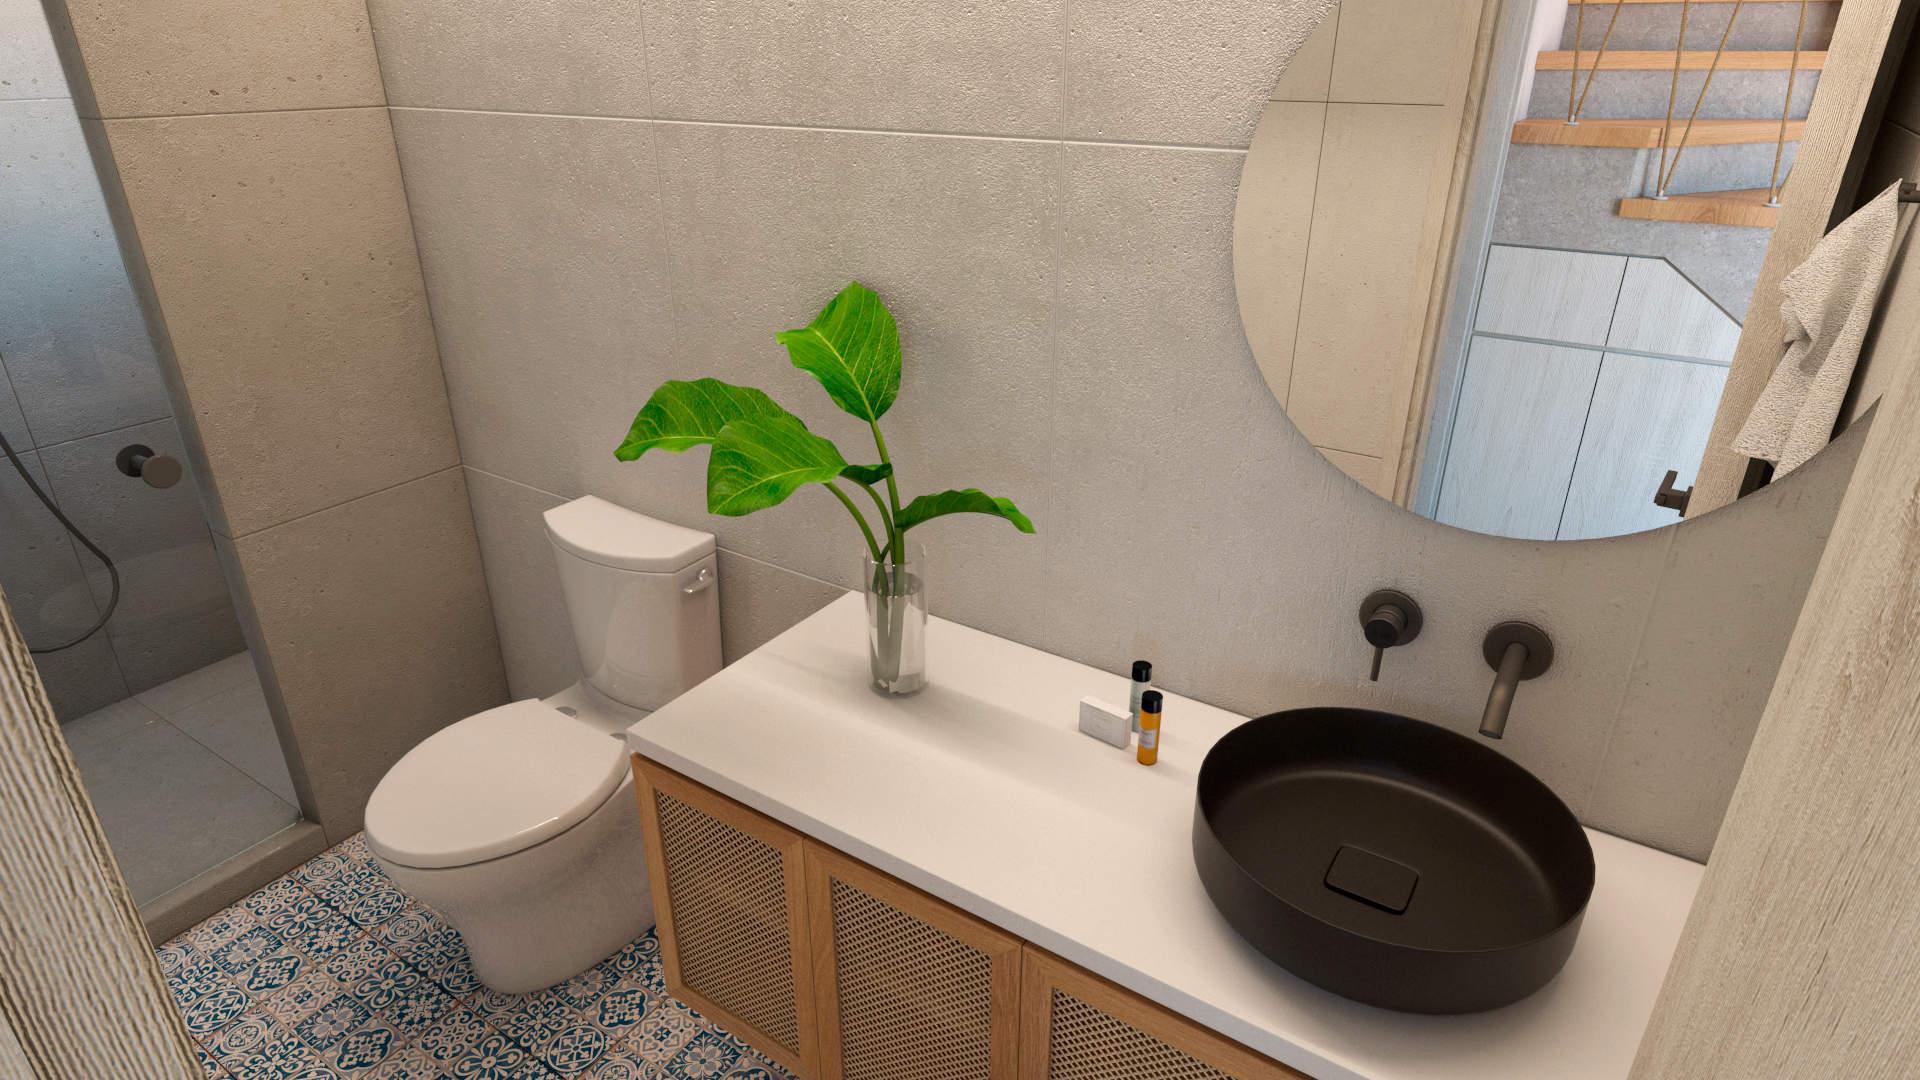 villas complex, interior design, bathroom. Συγκρότημα τουριστικών κατοικιών, εσωτερικός χώρος, μπάνιο.